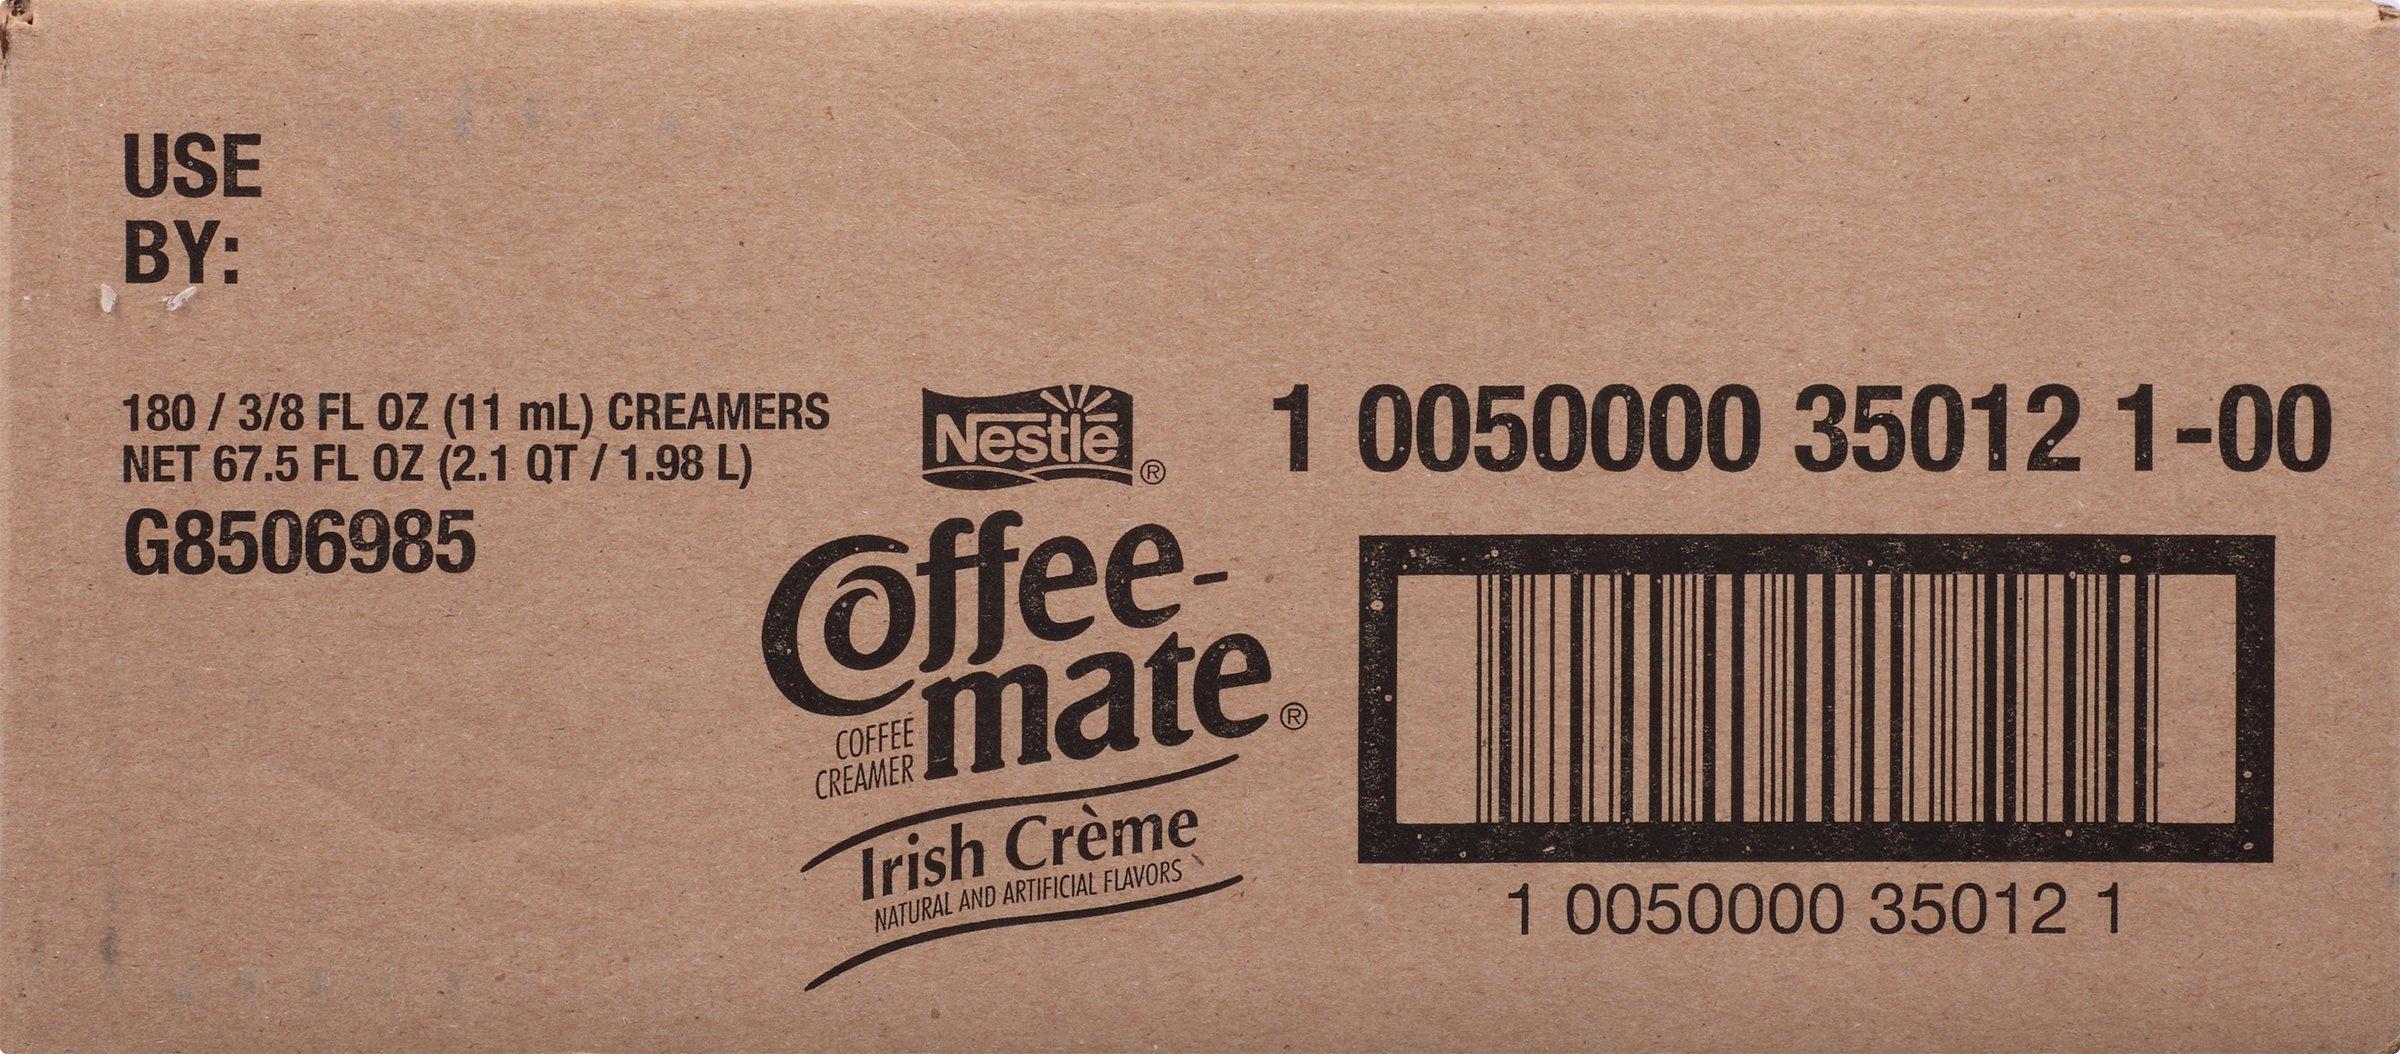 NESTLE COFFEE-MATE Coffee Creamer, Irish Creme, liquid creamer singles, 180 Count (Pack of 1) by Nestle Coffee Mate (Image #5)